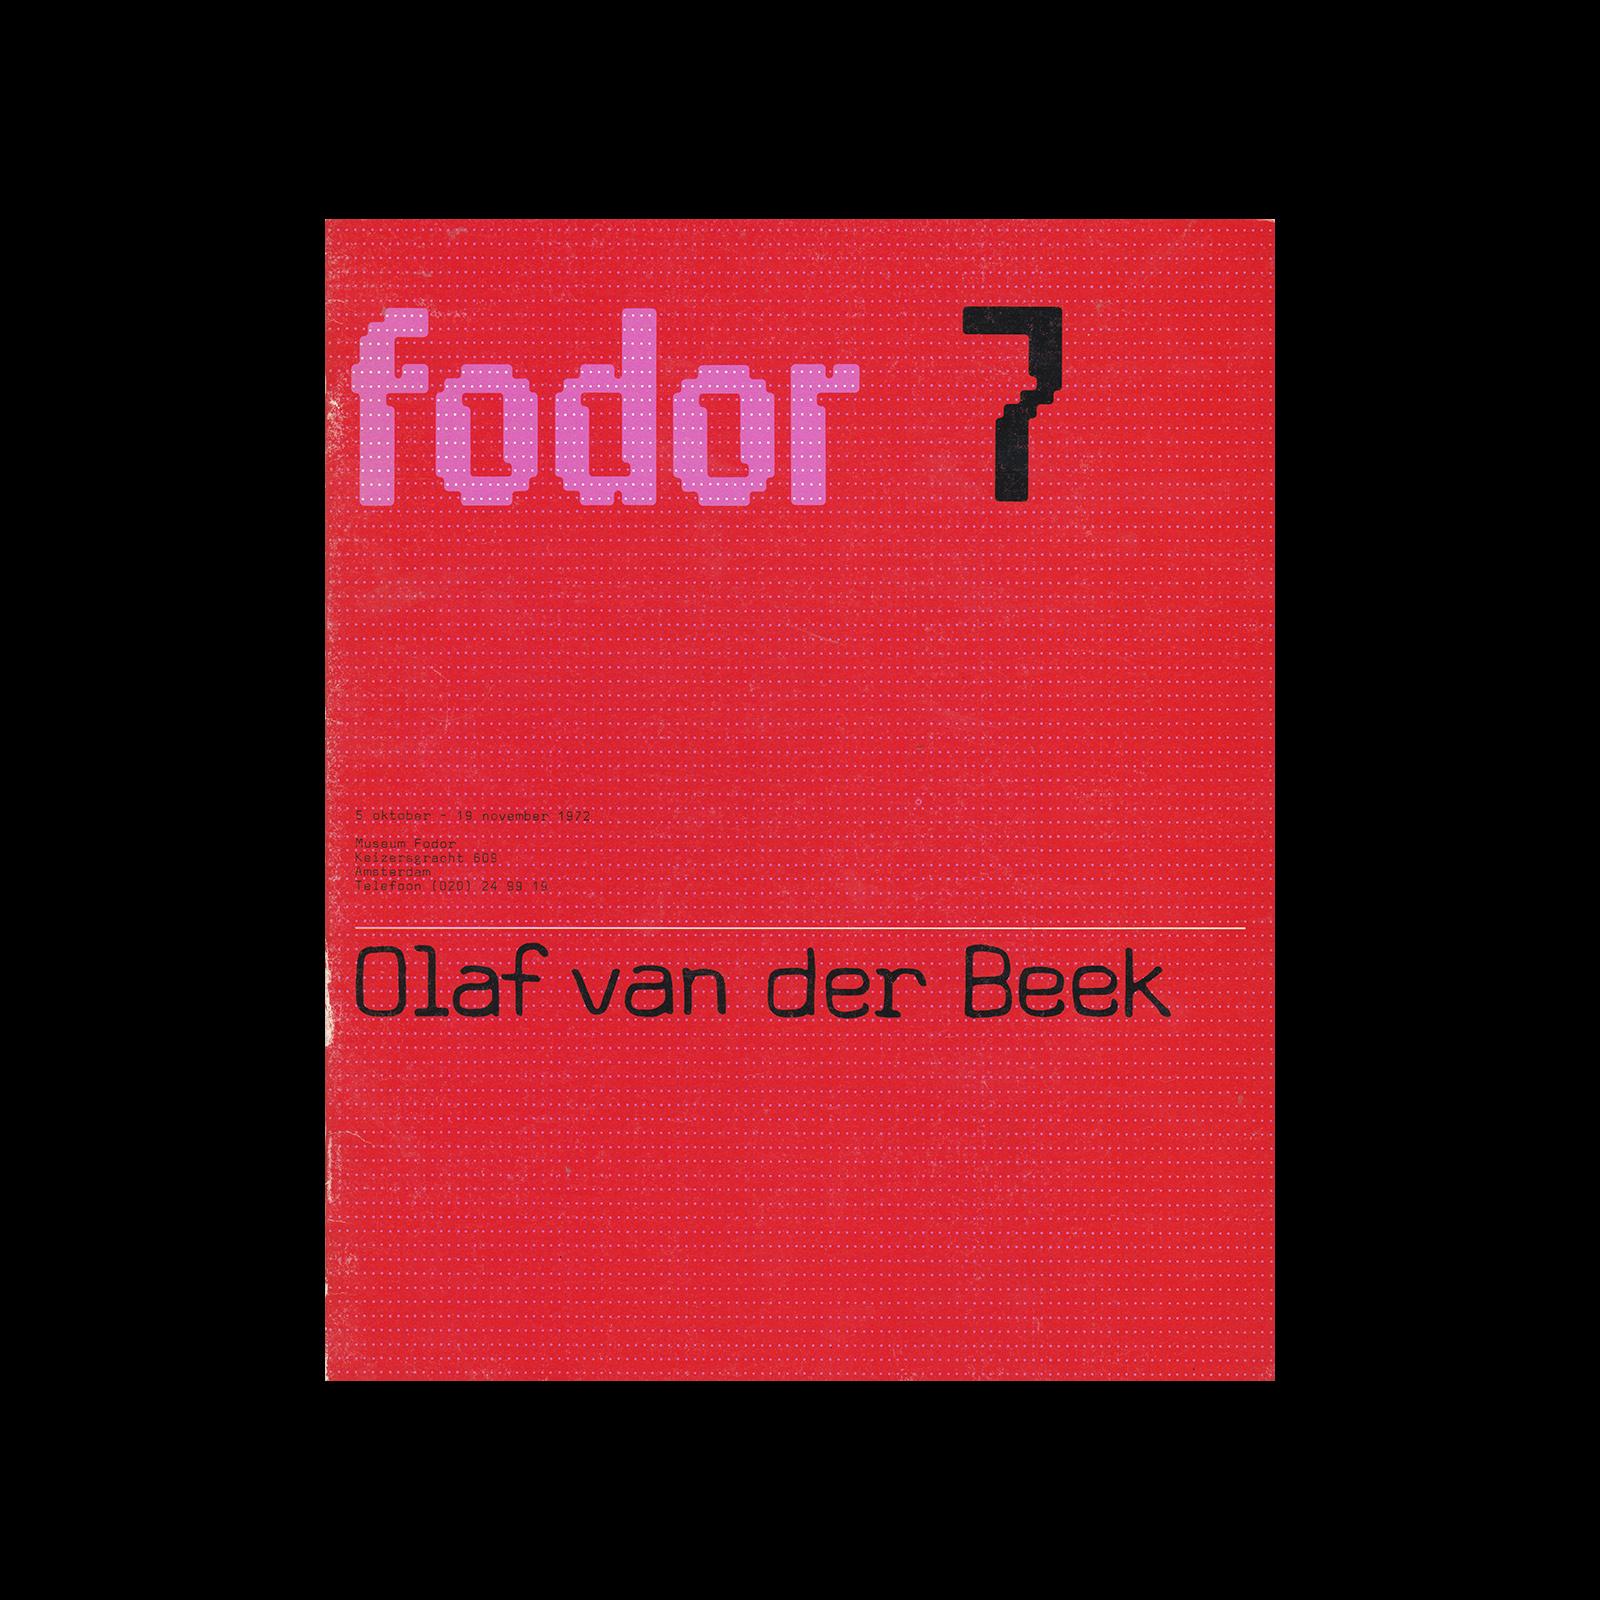 Fodor 7, 1972 - Kees Gerritse and Olaf van der Beek. Designed by Wim Crouwel and Jos van der Zwaan (Total Design).